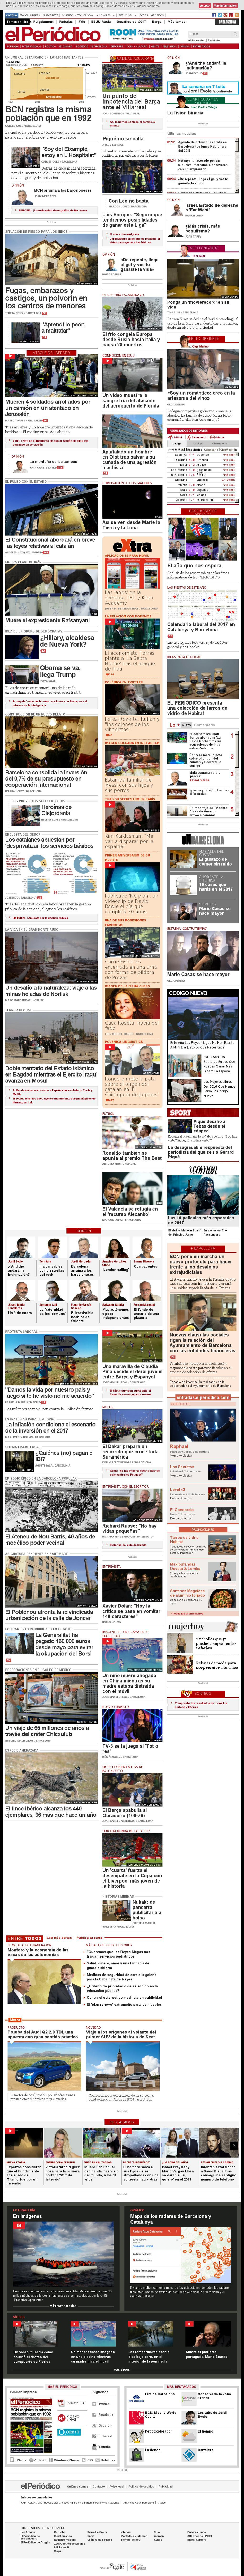 El Periodico at Monday Jan. 9, 2017, 12:13 a.m. UTC